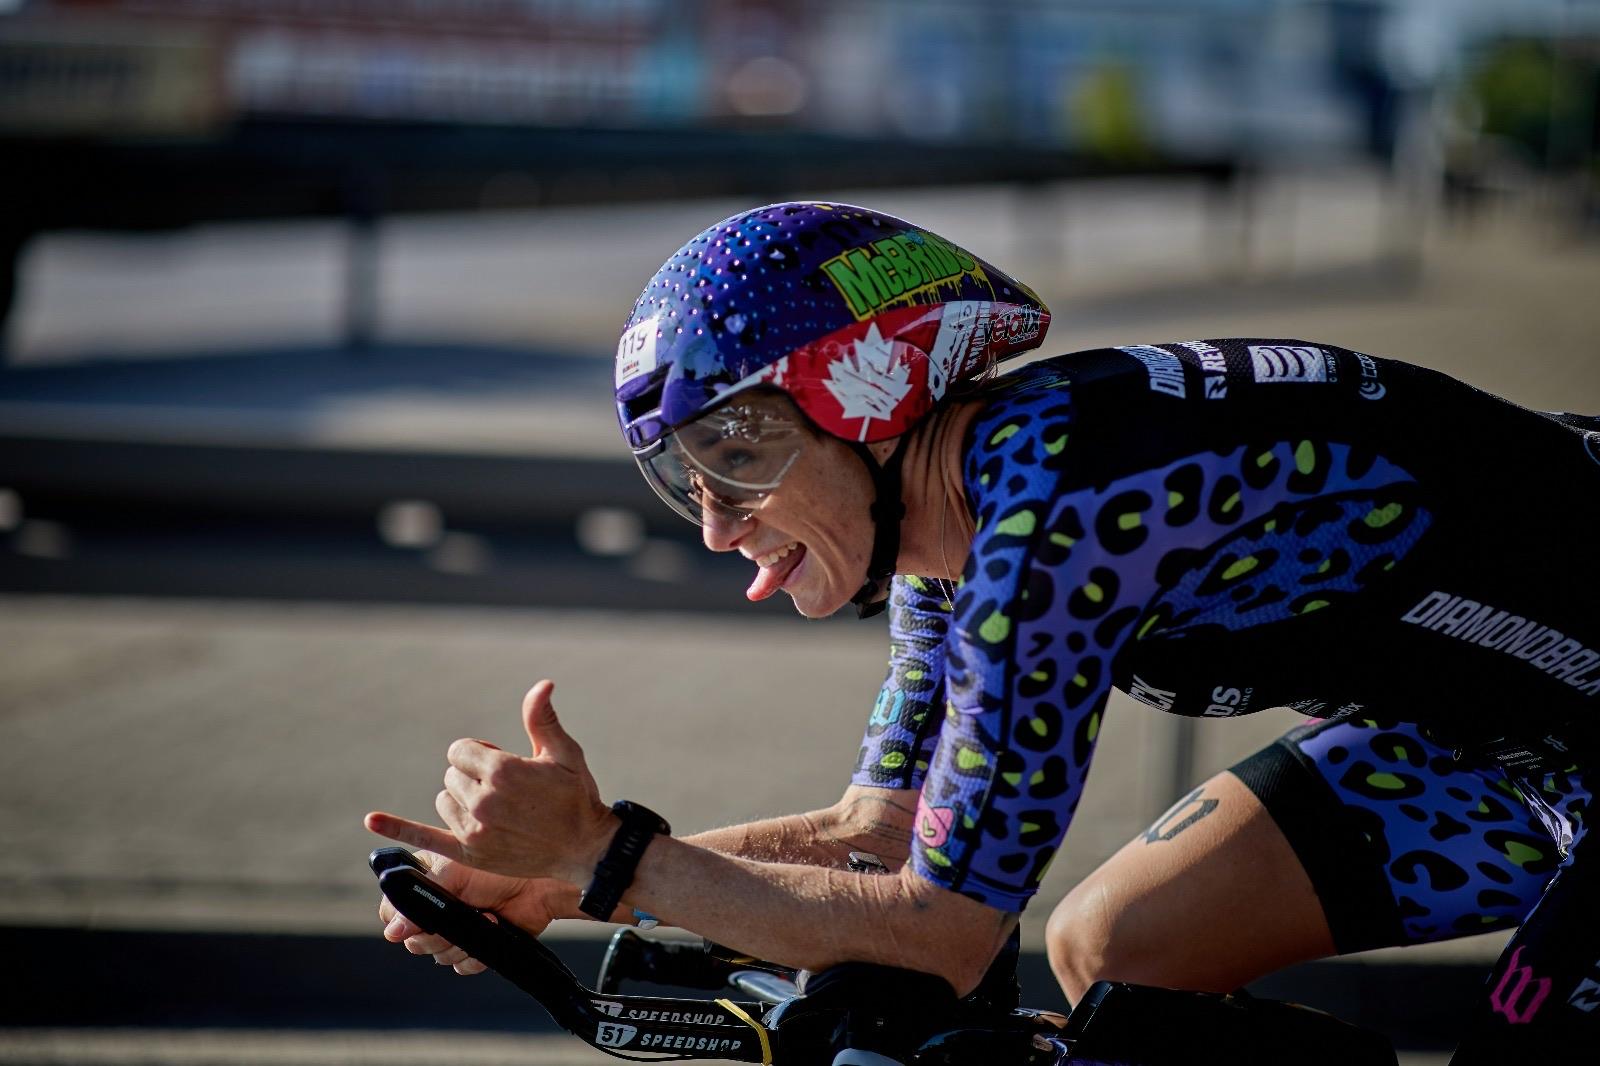 Coach_Terry_Wilson_Pursuit_of_The_Perfect_Race_IRONMAN_Franktfurt_Rachel_McBride_Isaak_Papadopoulos.JPG